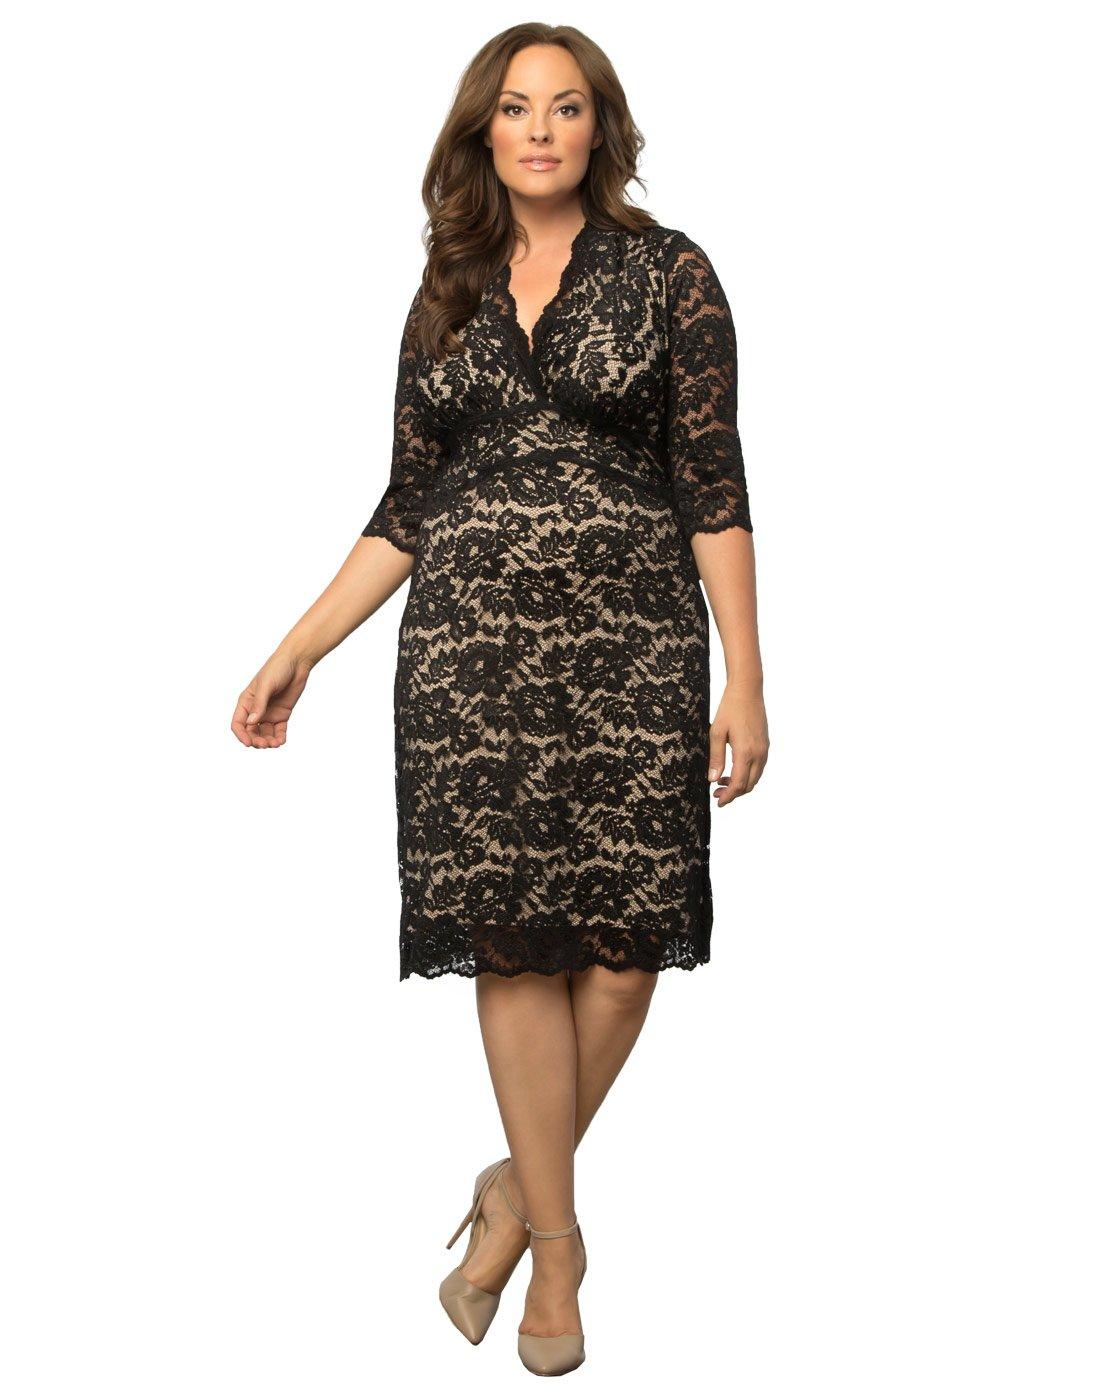 Women's Plus Size Scalloped Boudoir Lace Dress (3X, Black Lace/Nude Lining)